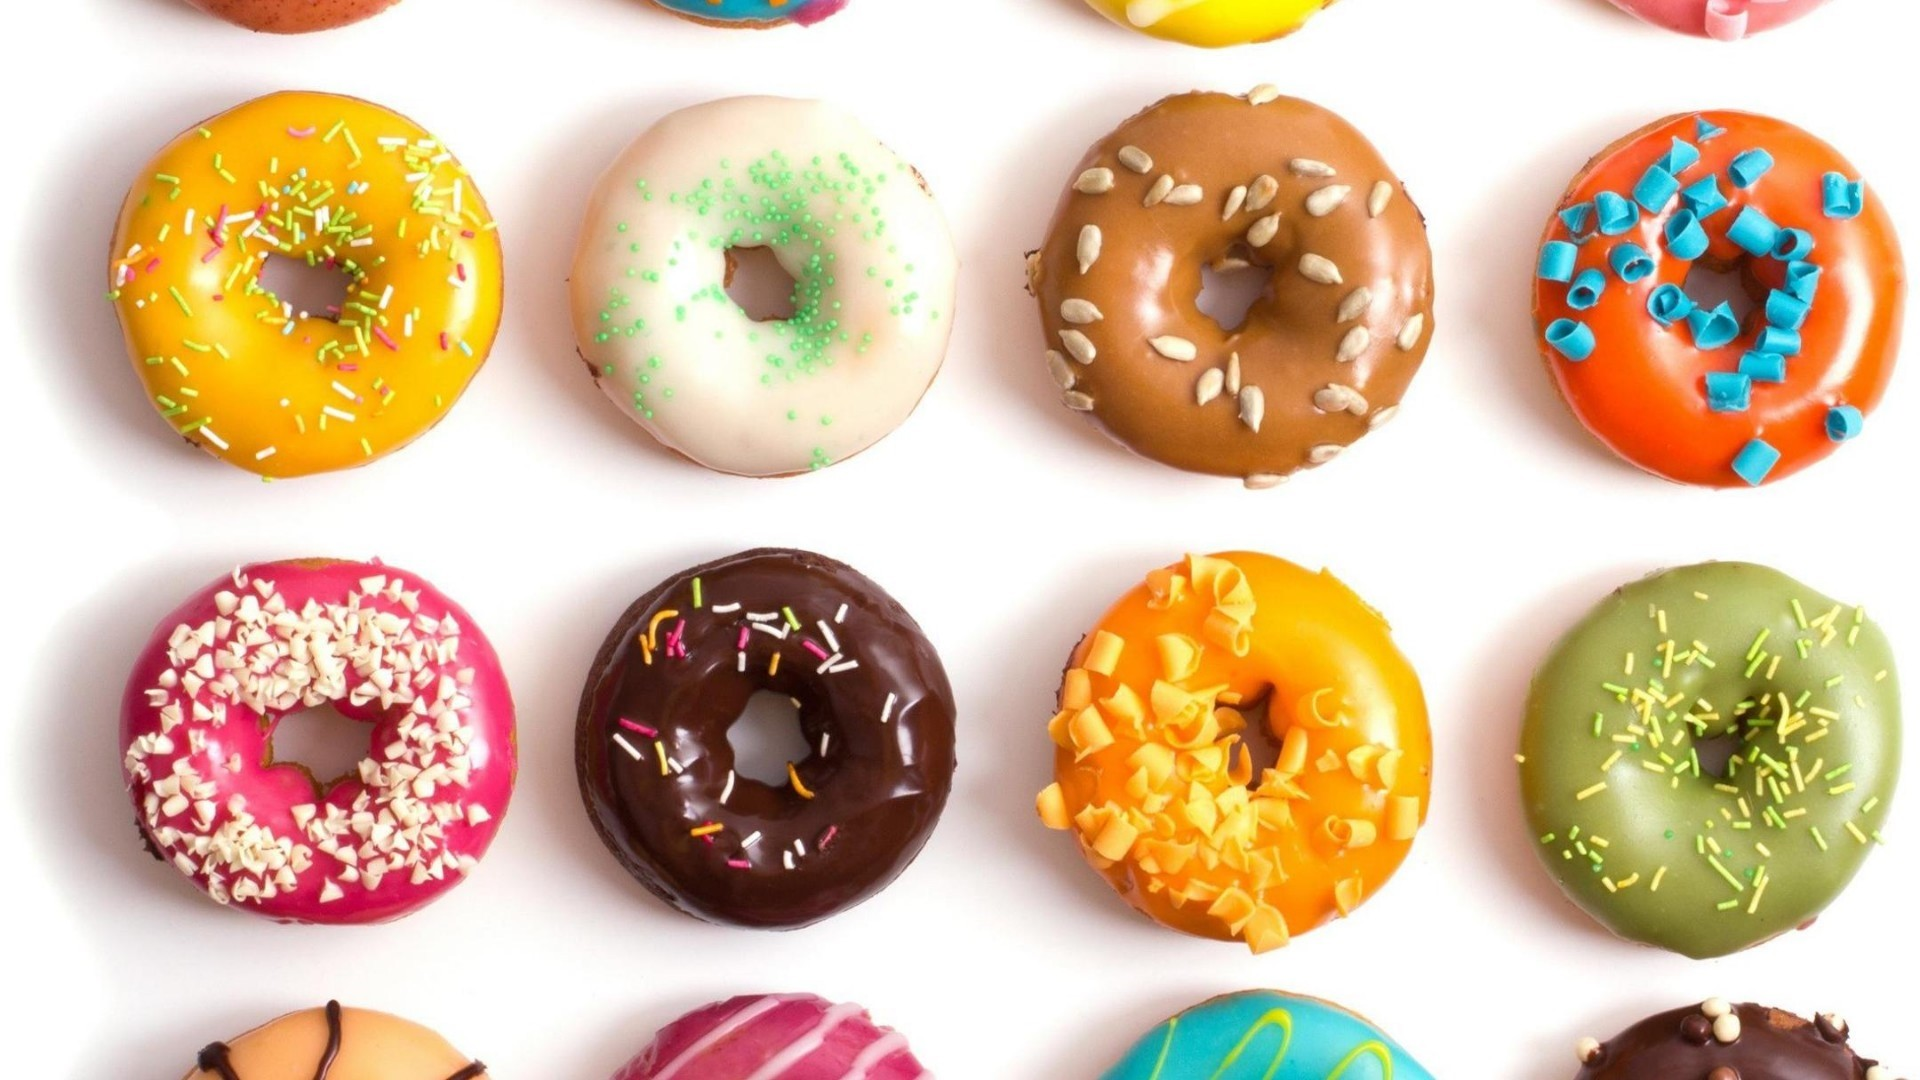 Donut PC Wallpaper